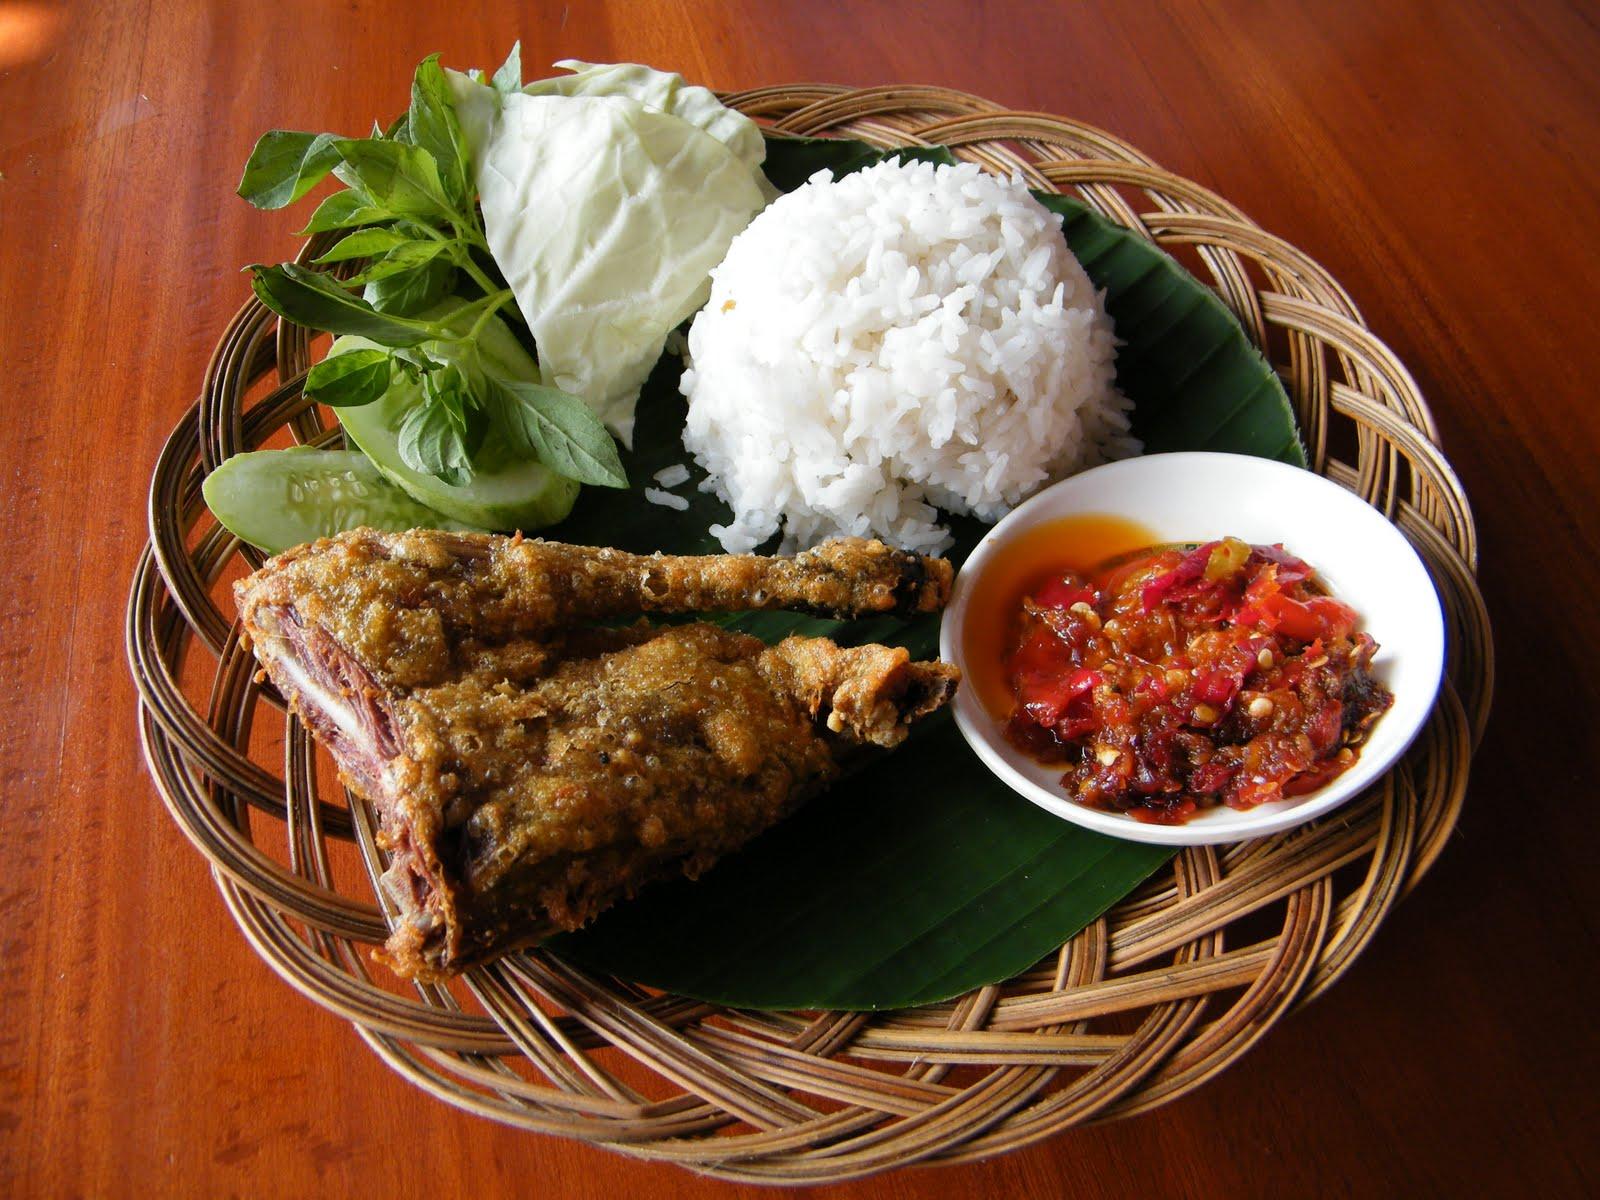 bebek goreng indonesian food